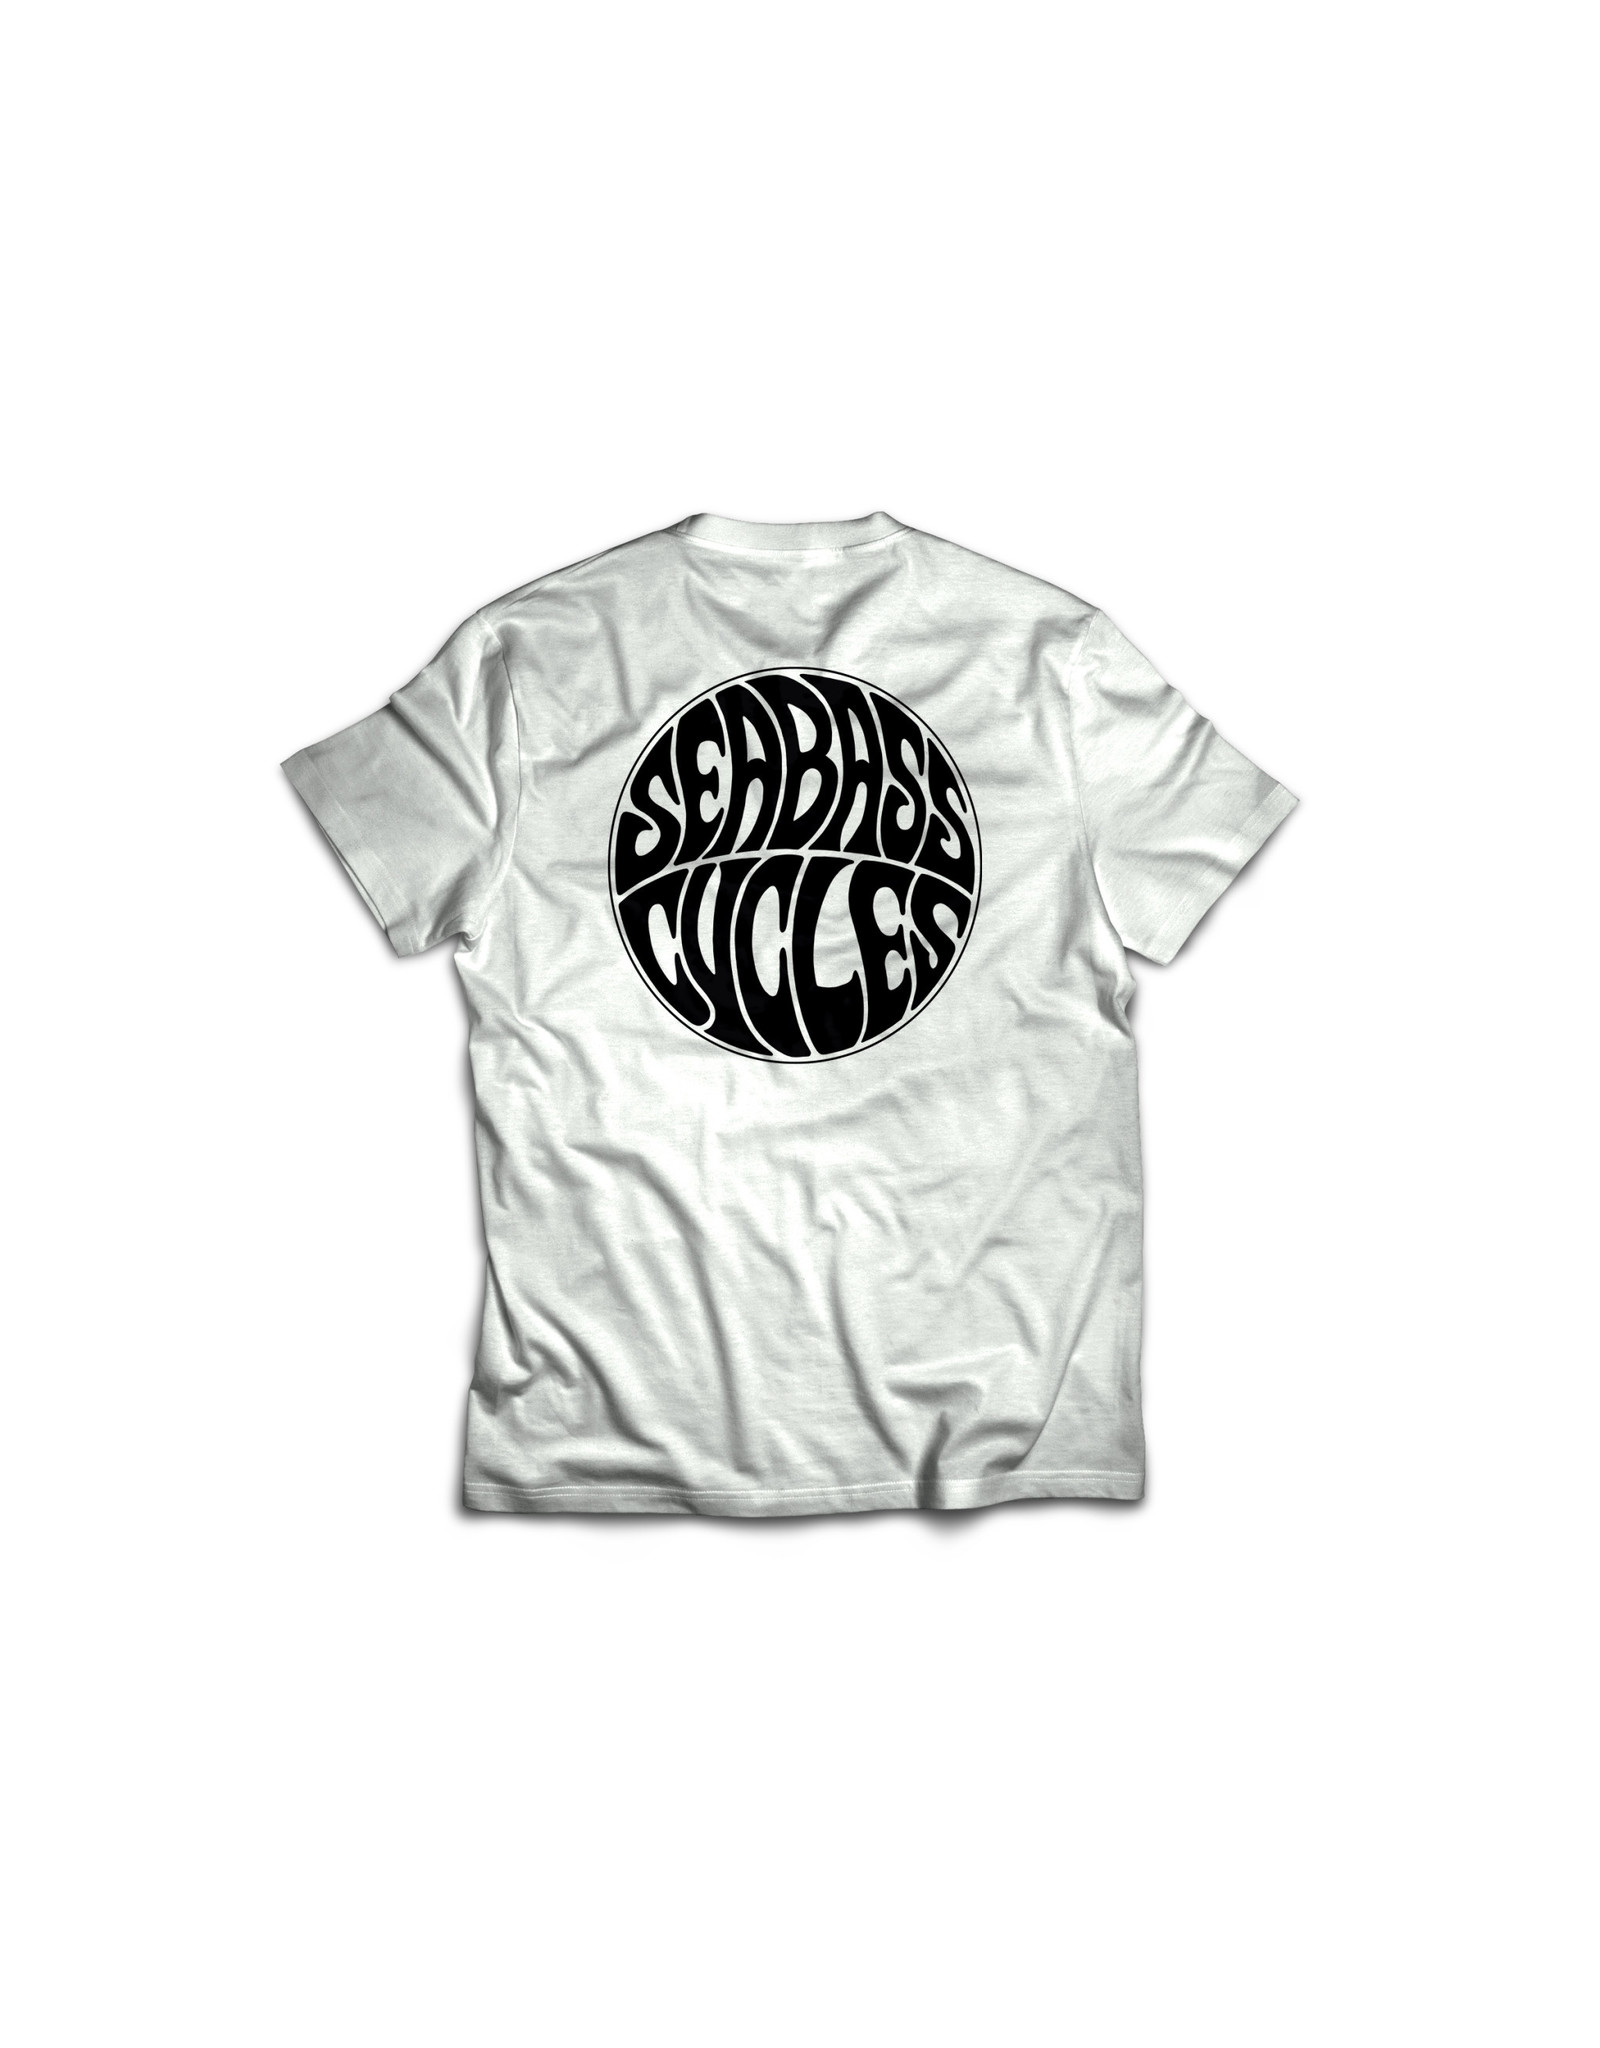 Seabass Cycles Seabass Cycles - Circle Logo - White / Black Ink